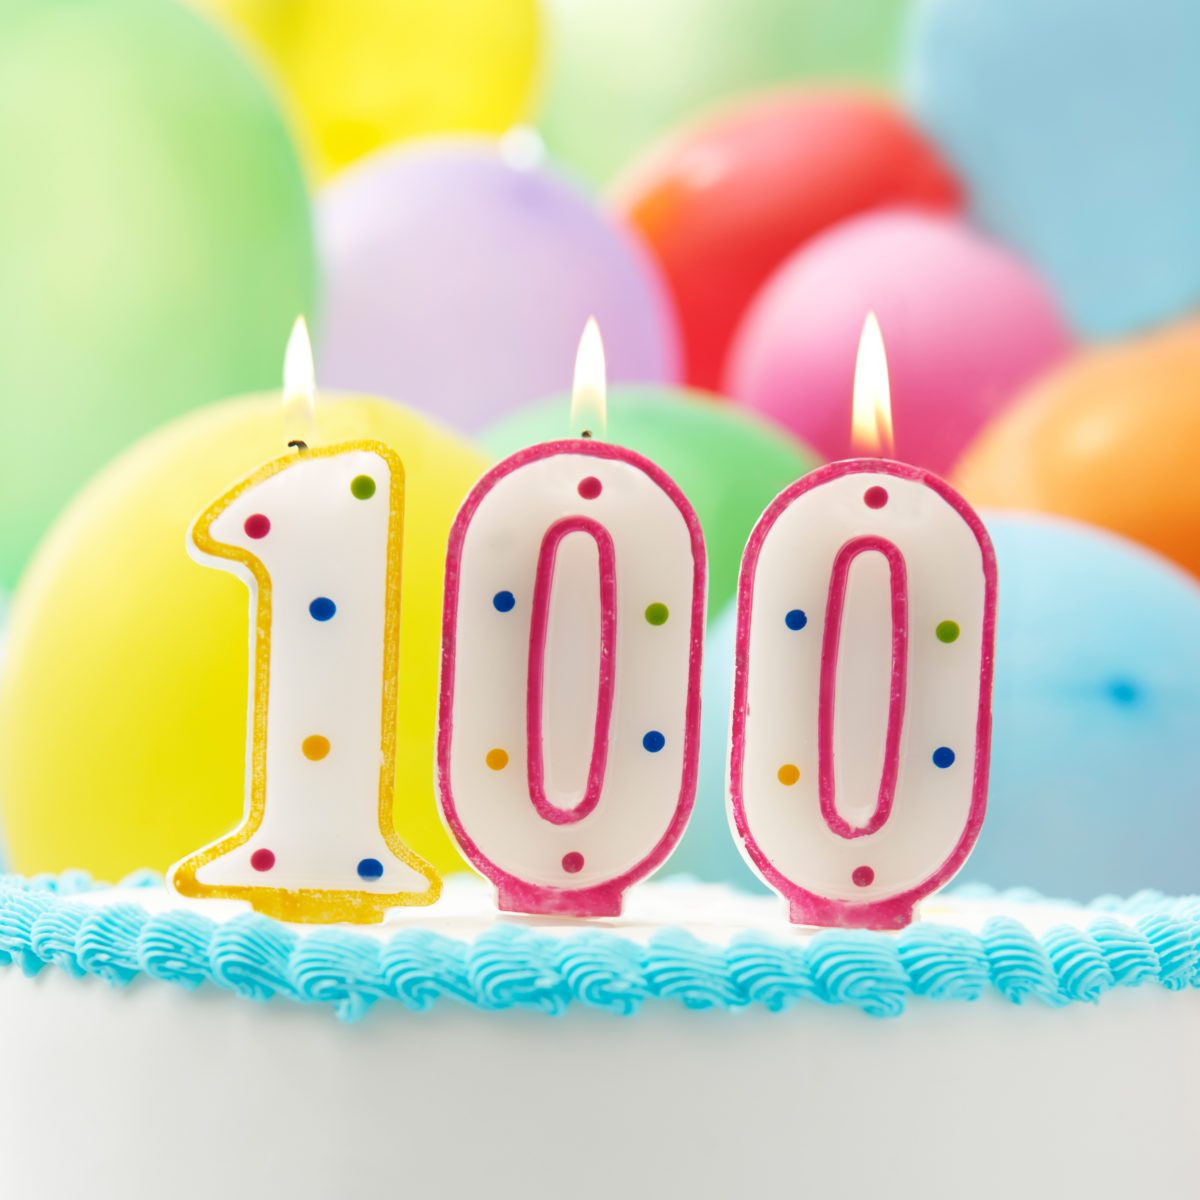 100 Things Turning 100 in 2020